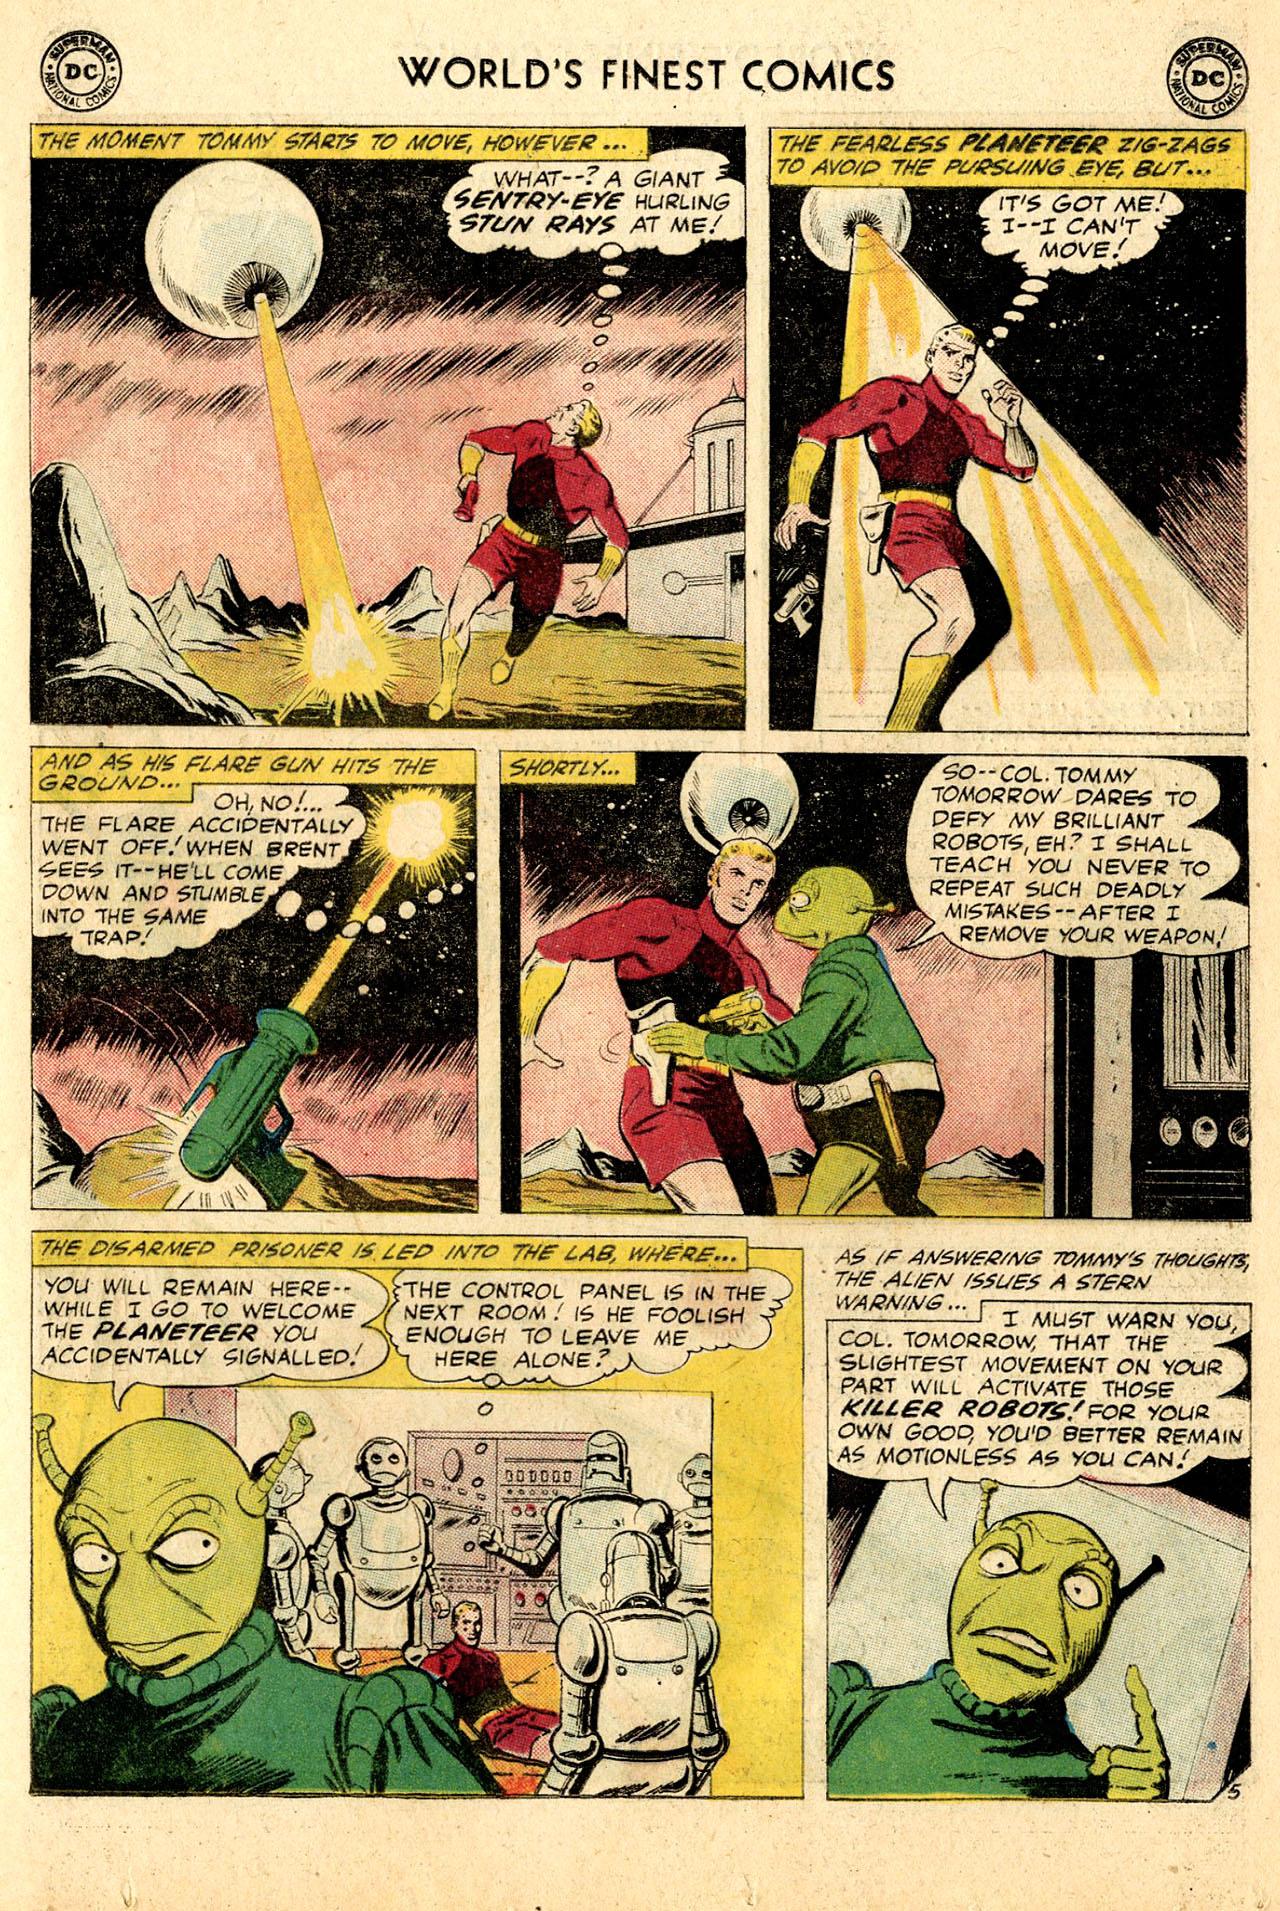 Read online World's Finest Comics comic -  Issue #110 - 21